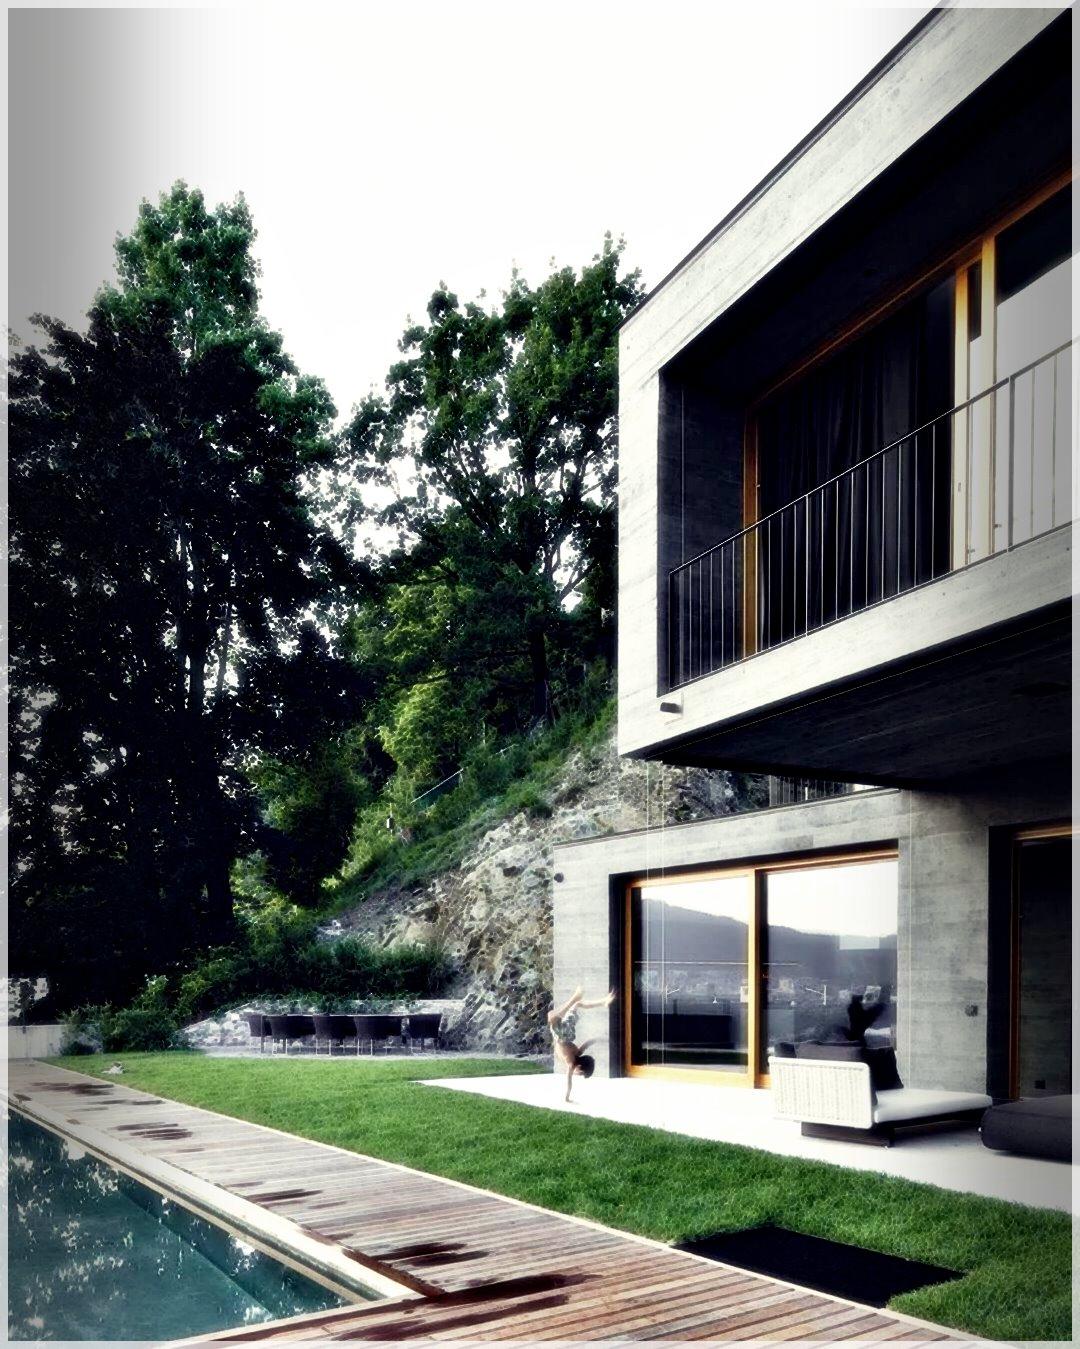 ModernHouse-17405682311